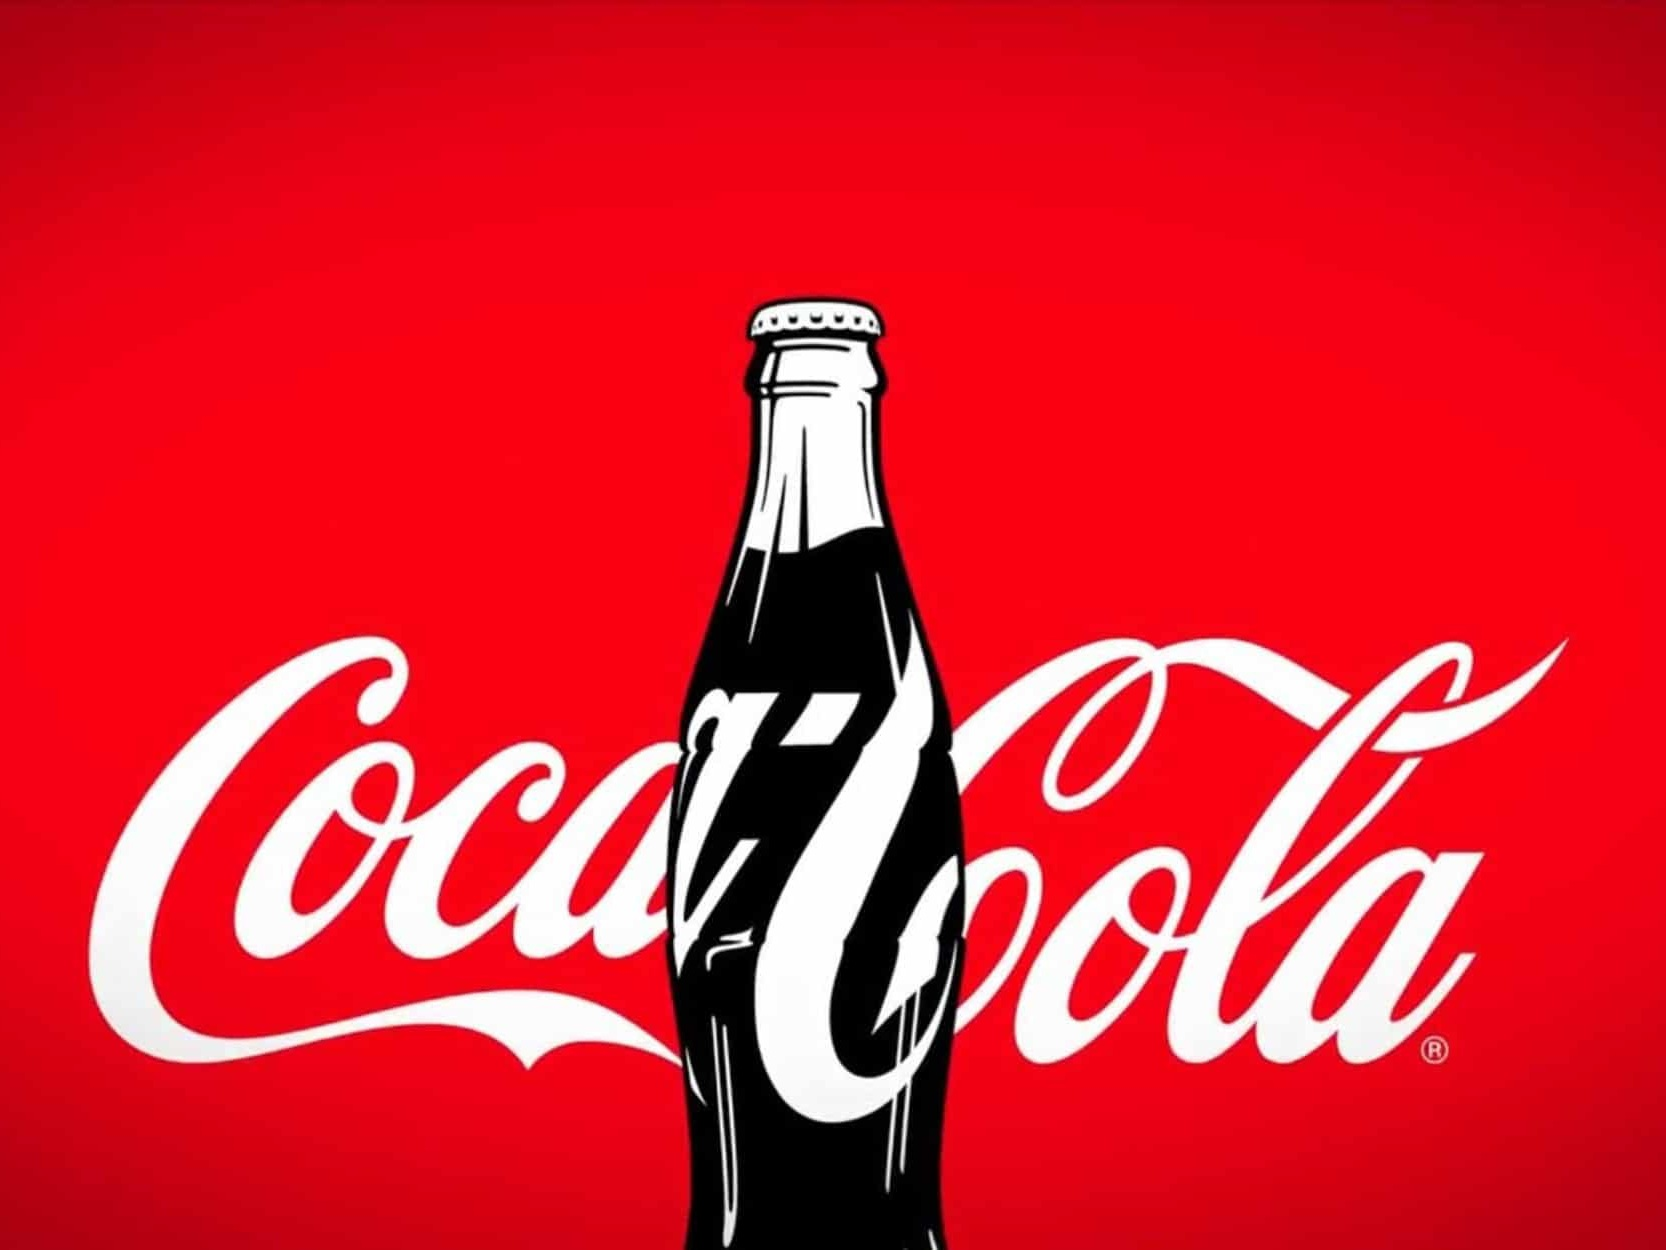 Coca-Cola-9.jpg